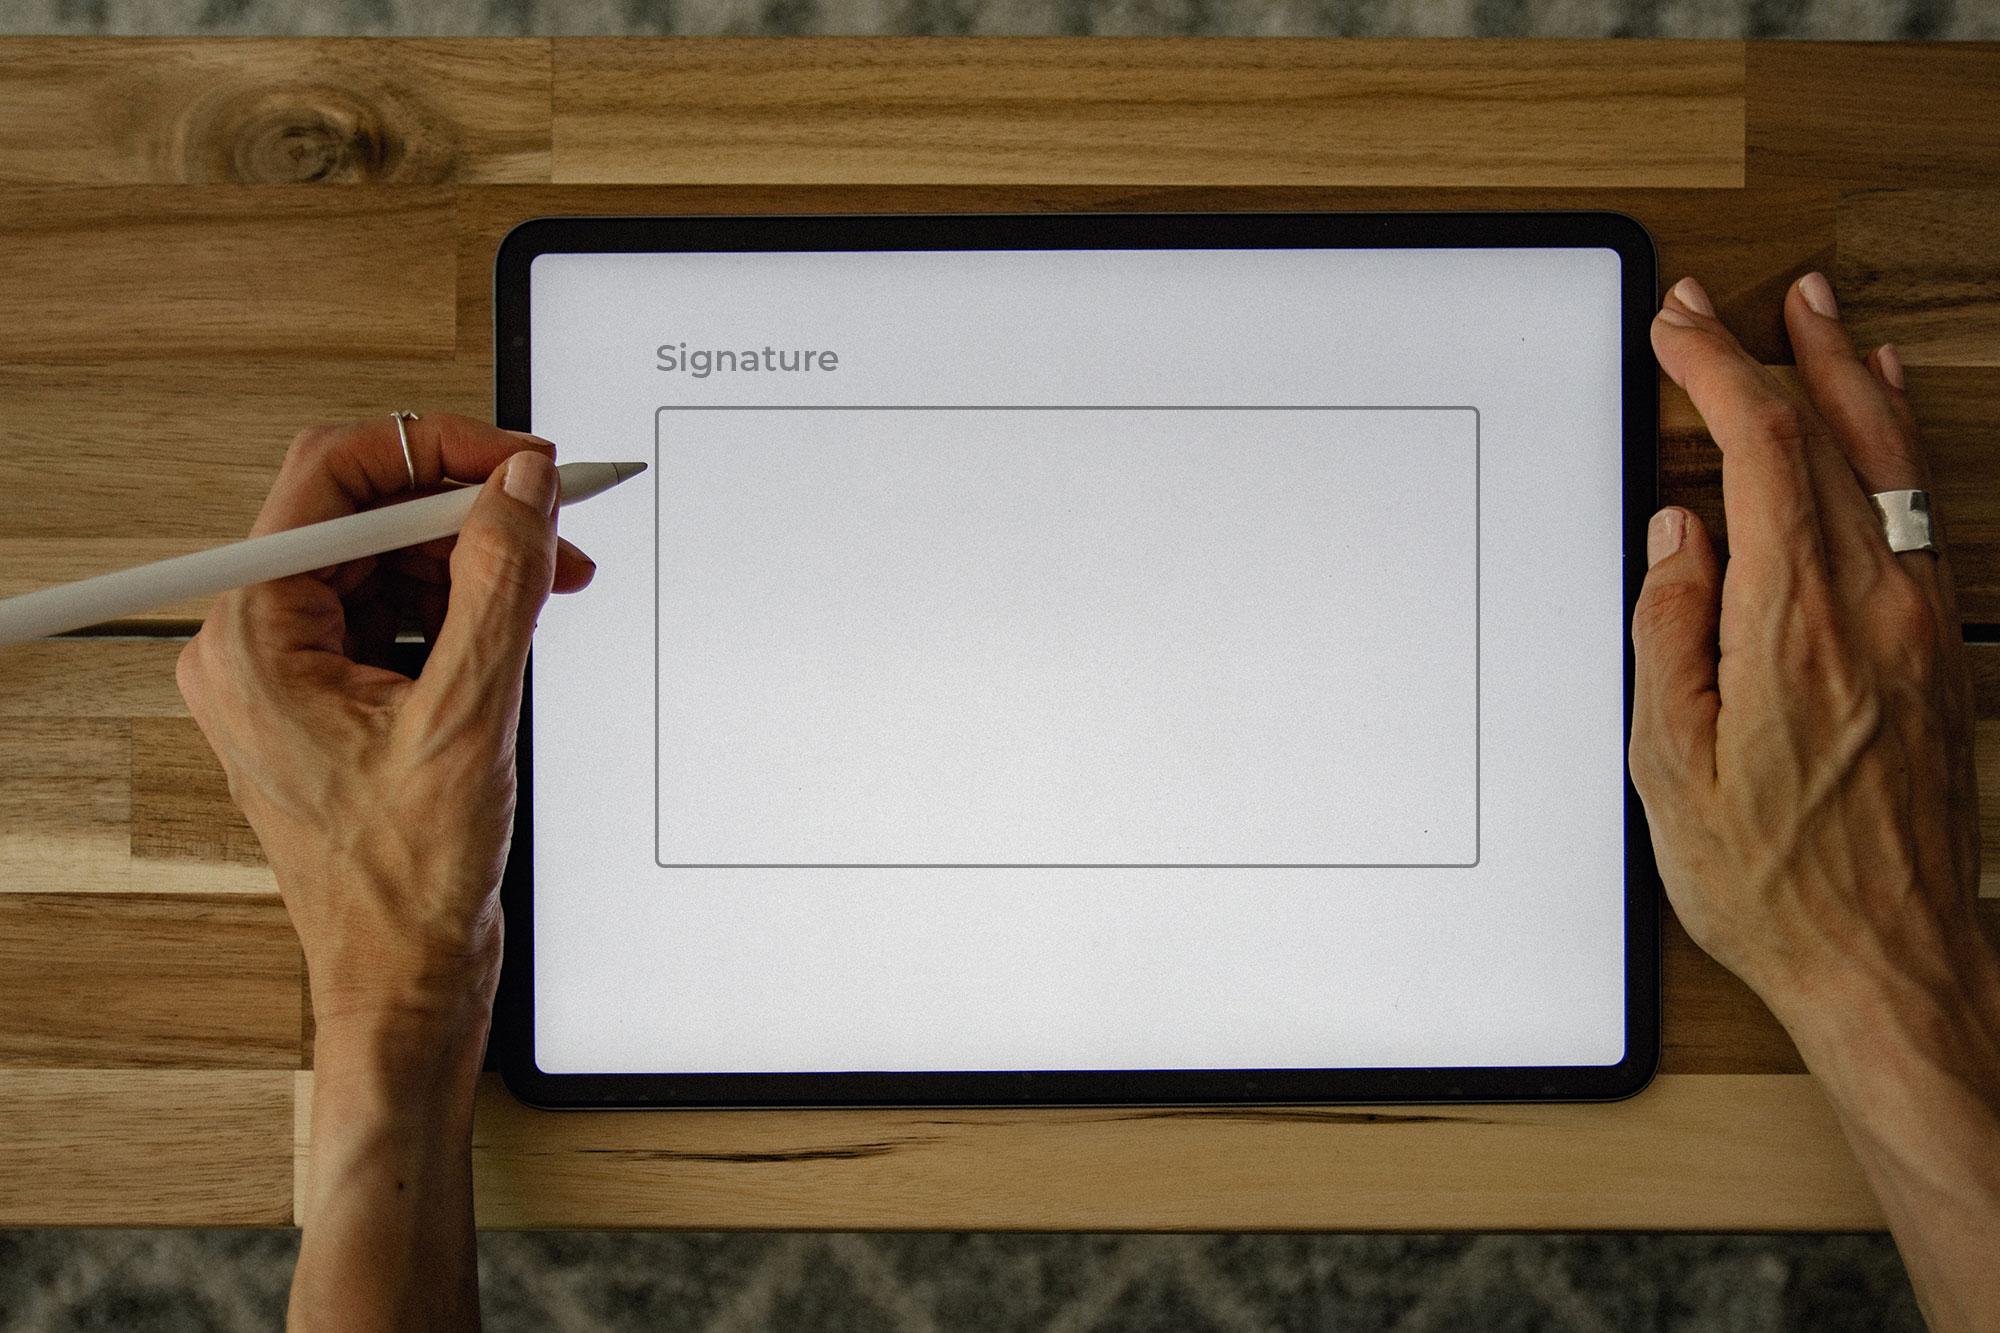 Signing an iPad